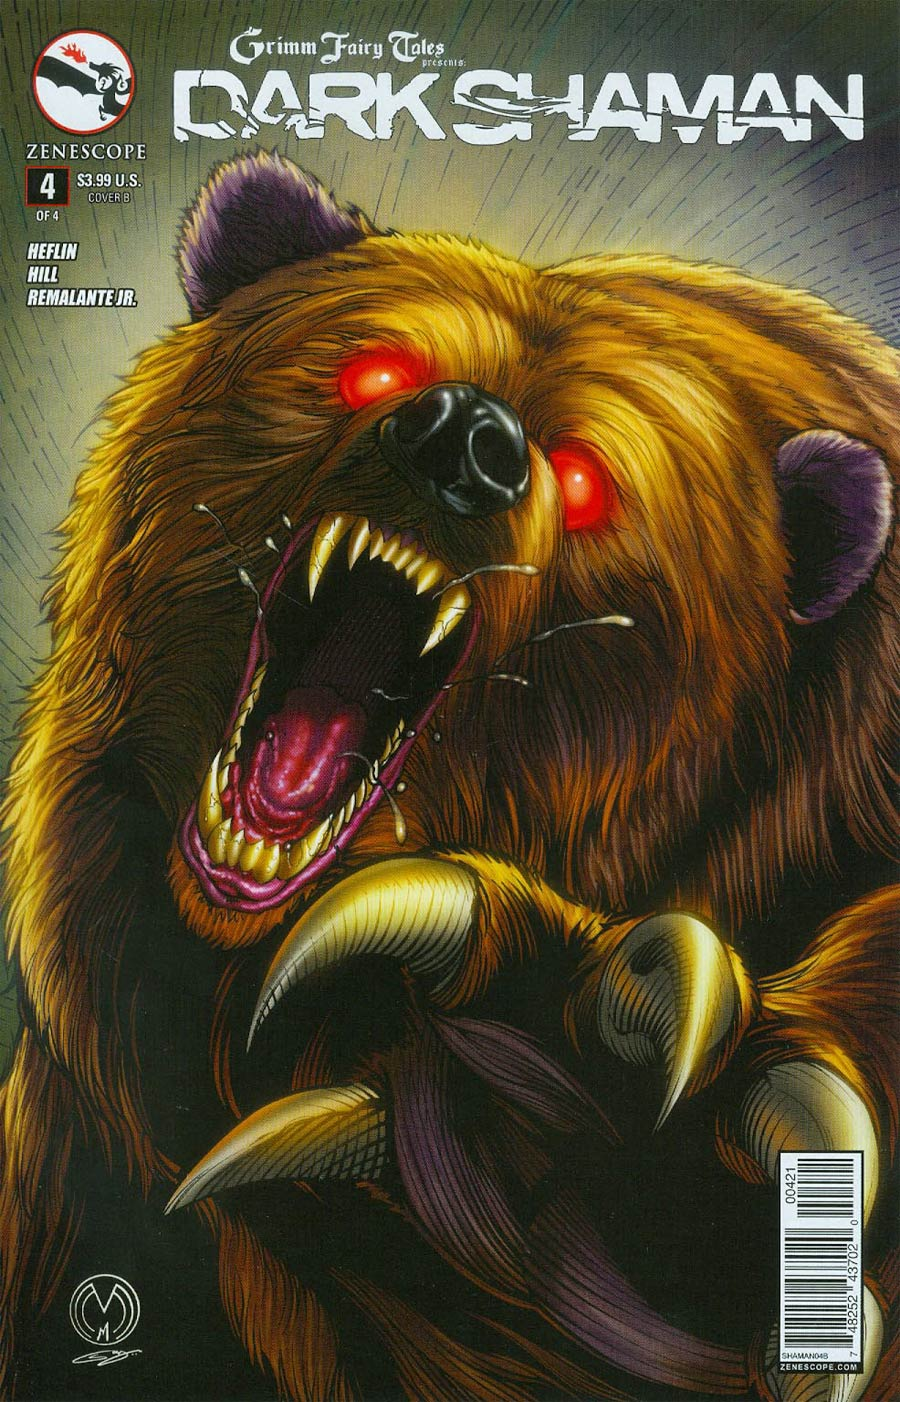 Grimm Fairy Tales Presents Dark Shaman #4 Cover B Marat Mychaels & Sanju Nivangune